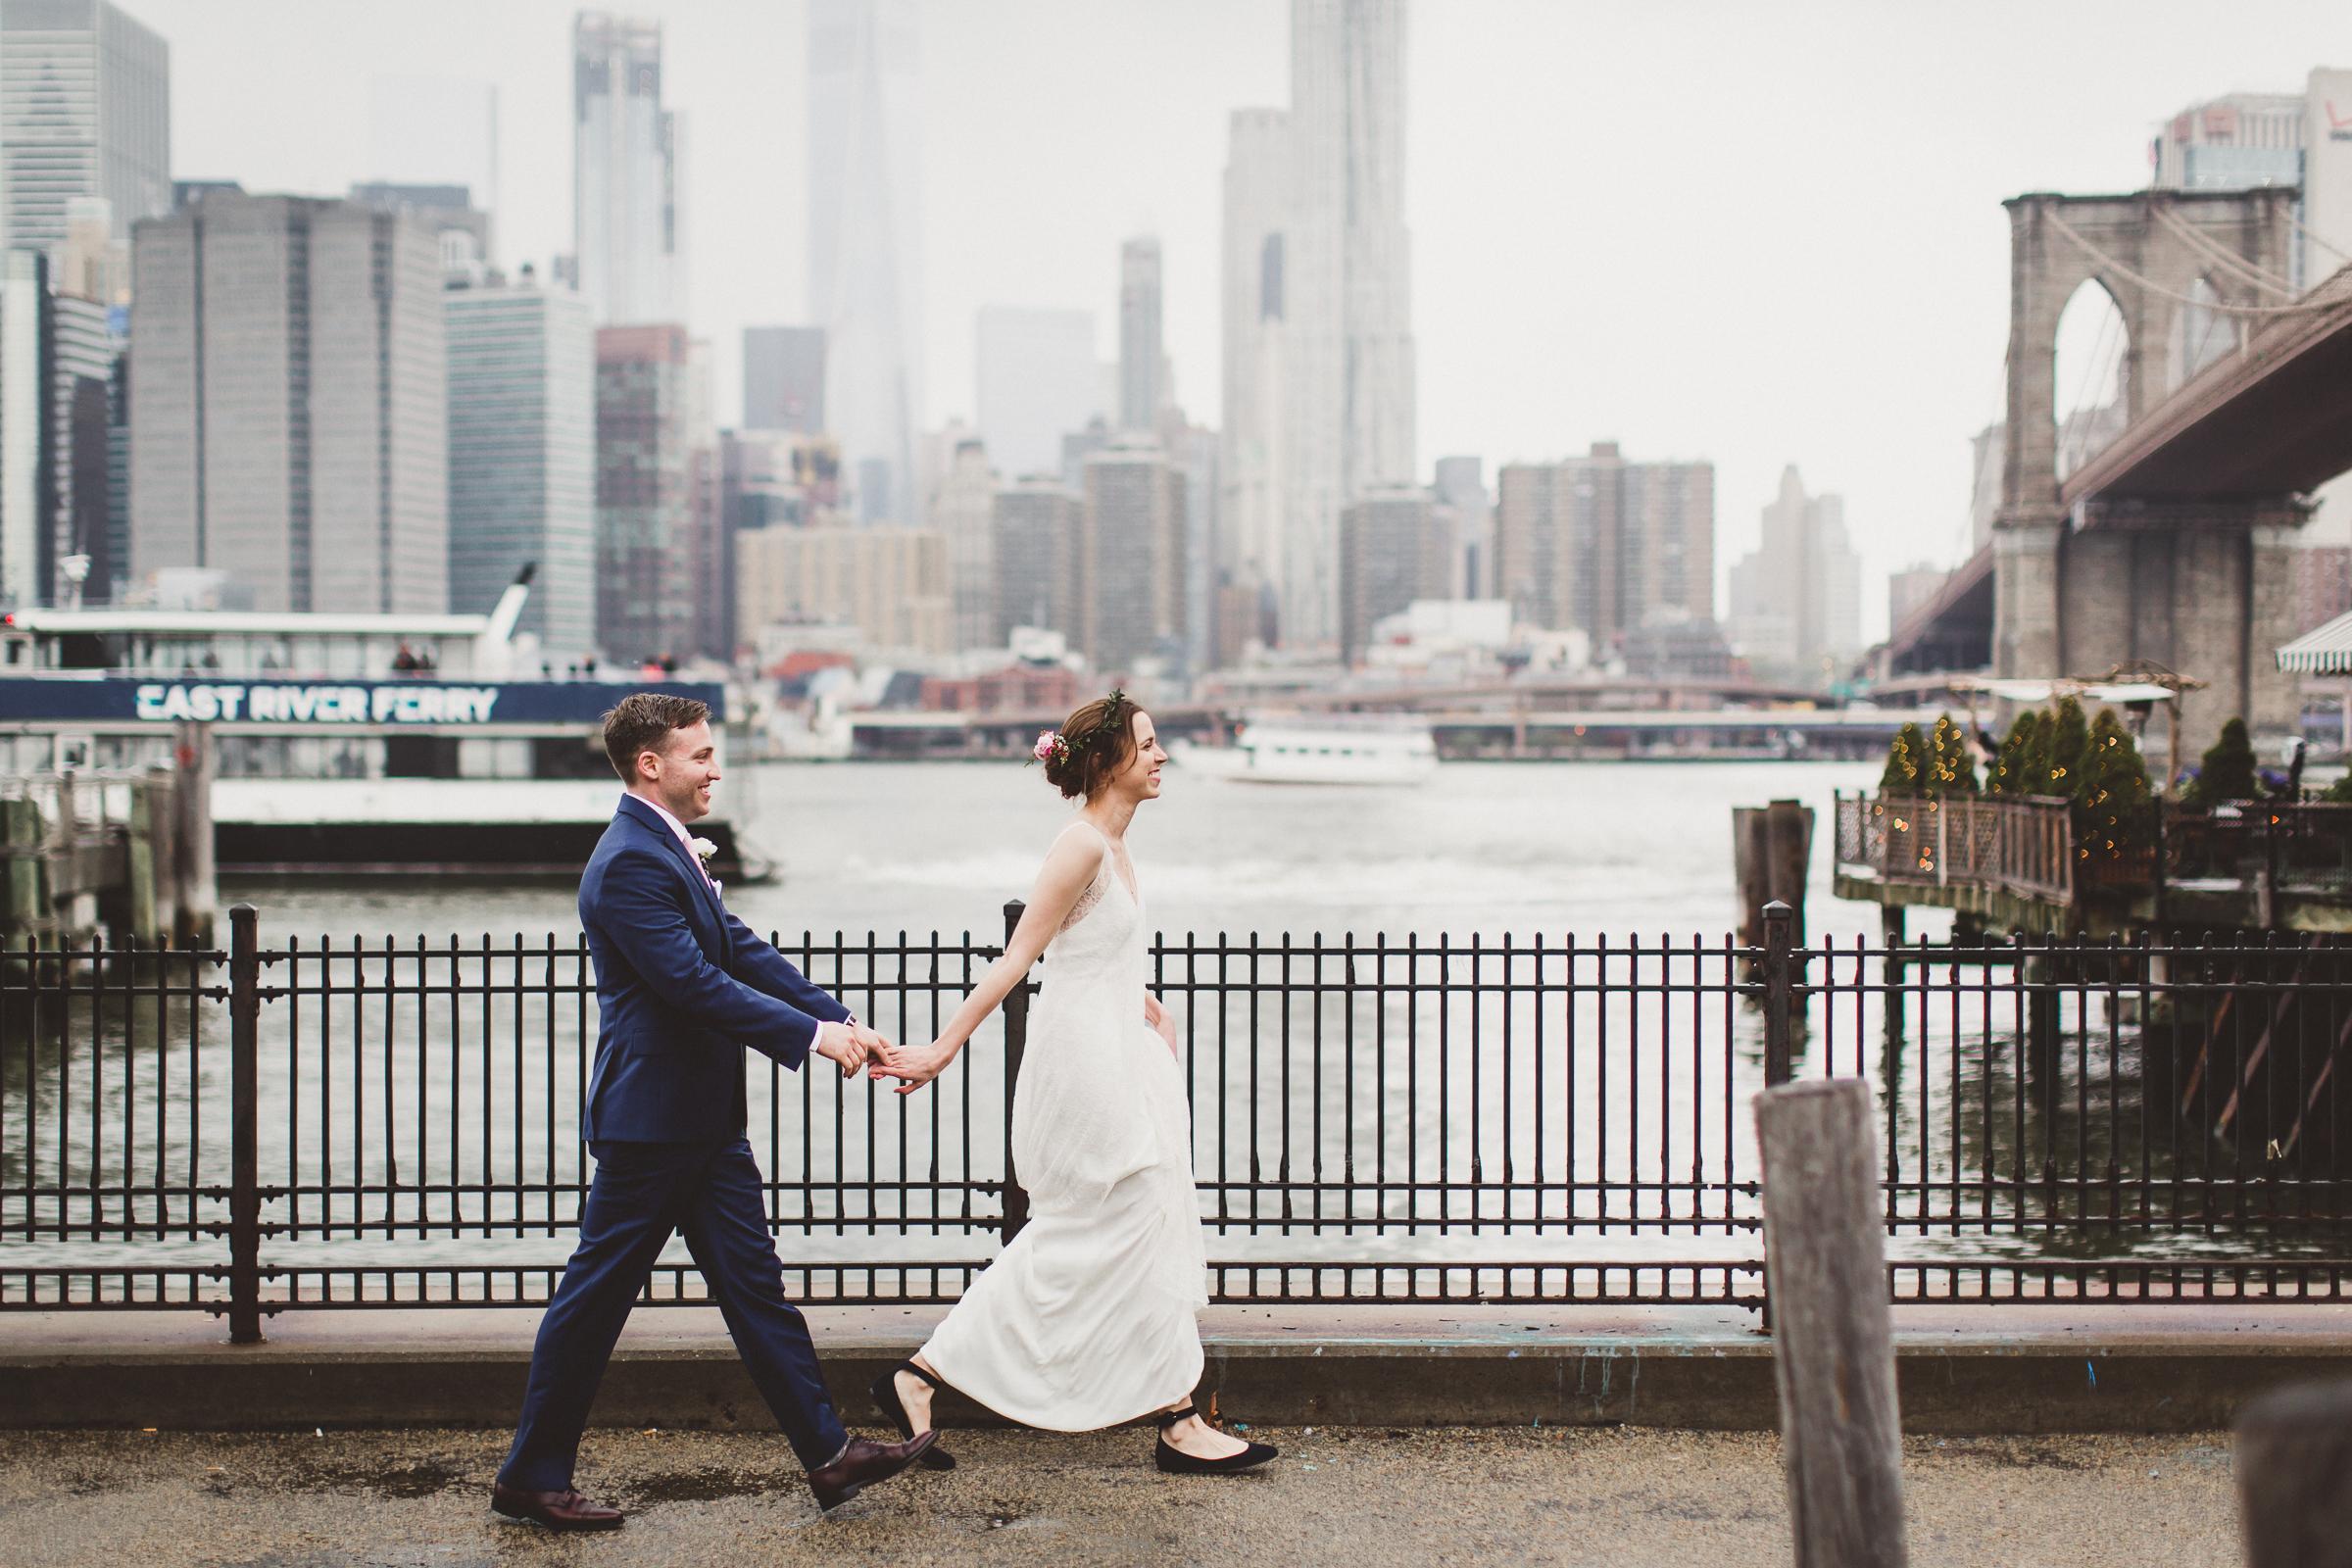 New-York-Documentary-Wedding-Photography-Best-Of-2017-by-Elvira-Kalviste-Photography-88.jpg